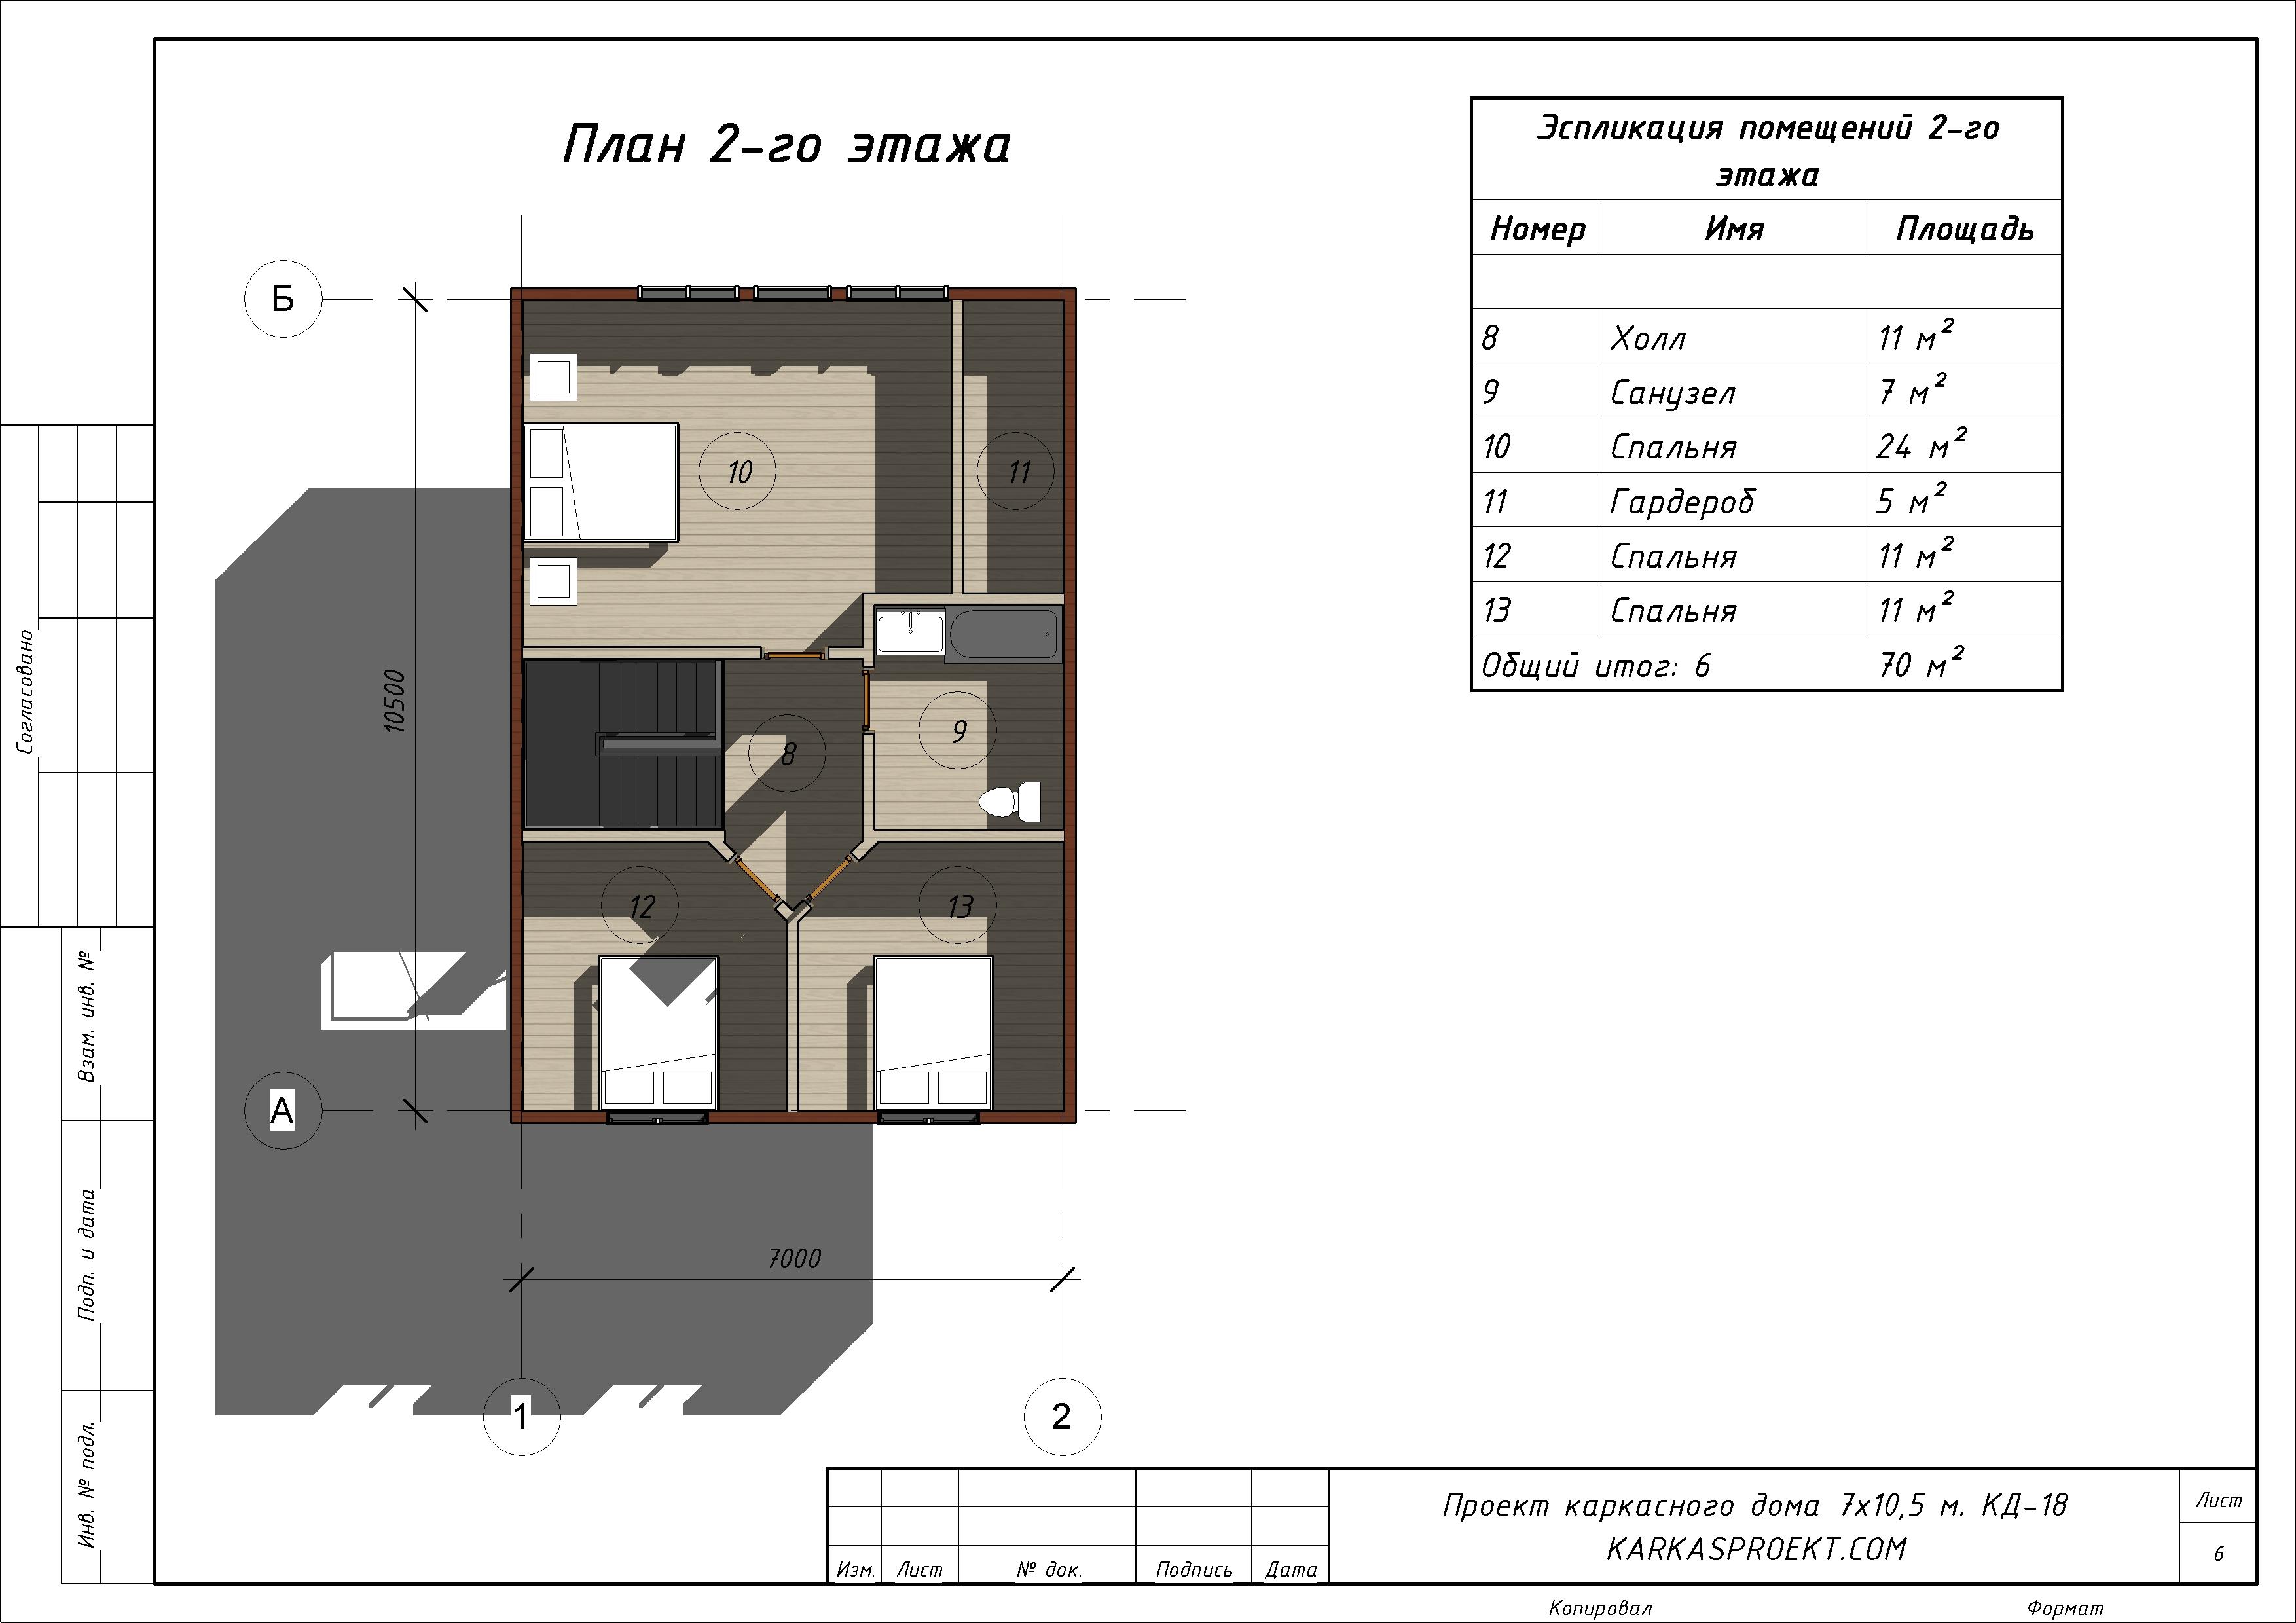 КД-18 - План 2-го этажа